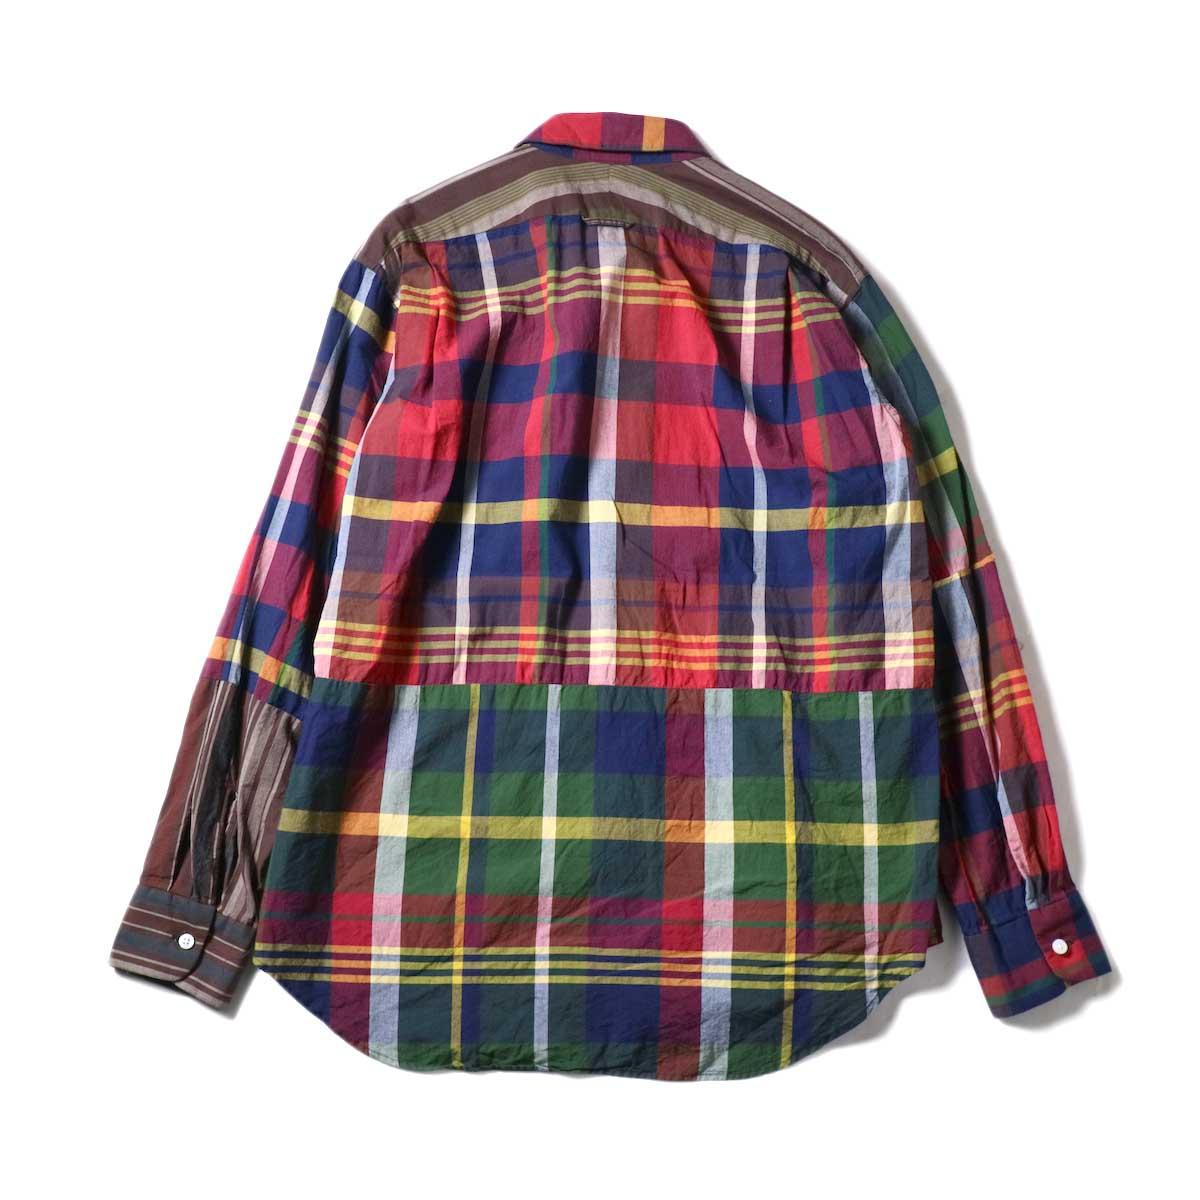 Engineered Garments / Combo Short Collar Shirt -Cotton Big Madras Plaid (Red/Nav)背面